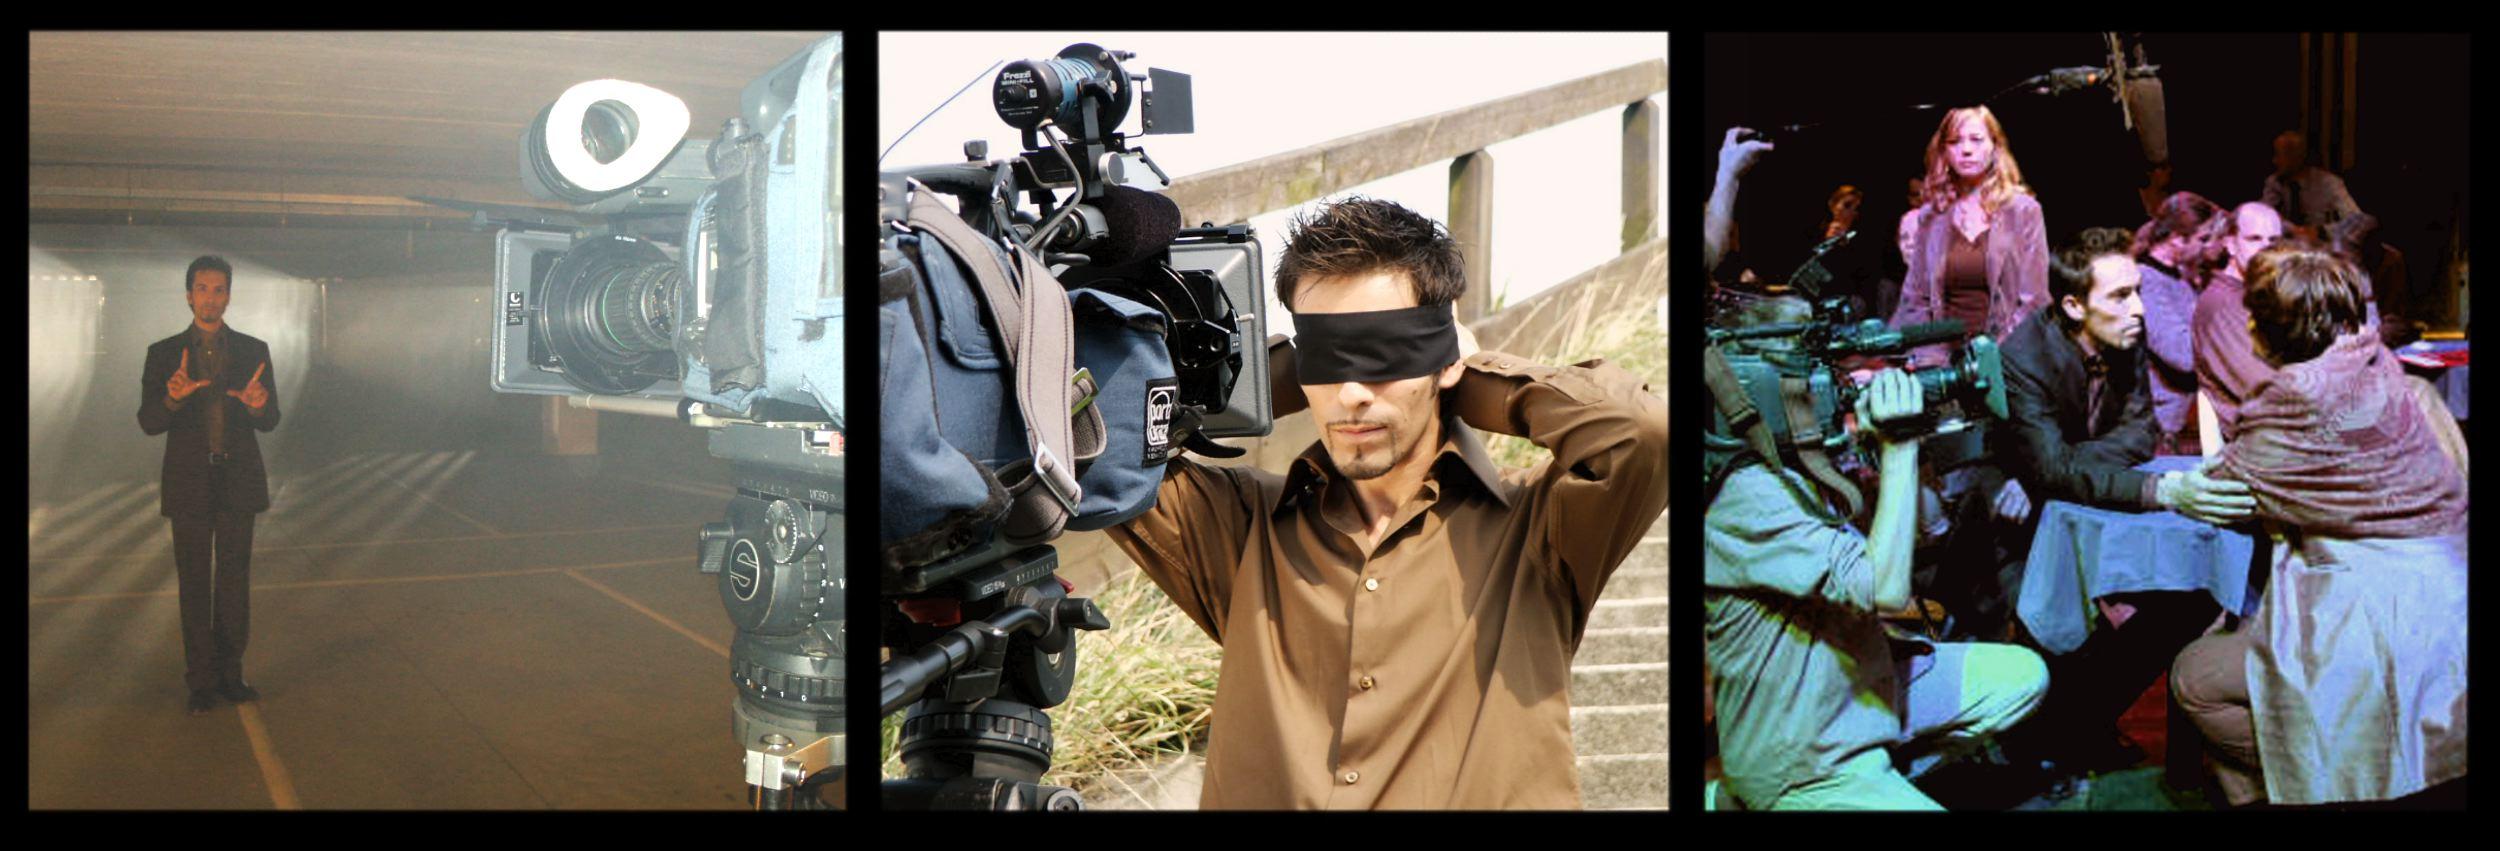 Joe Pequerrucho MindLeader JPQ mentalist magic entertainer blindfold